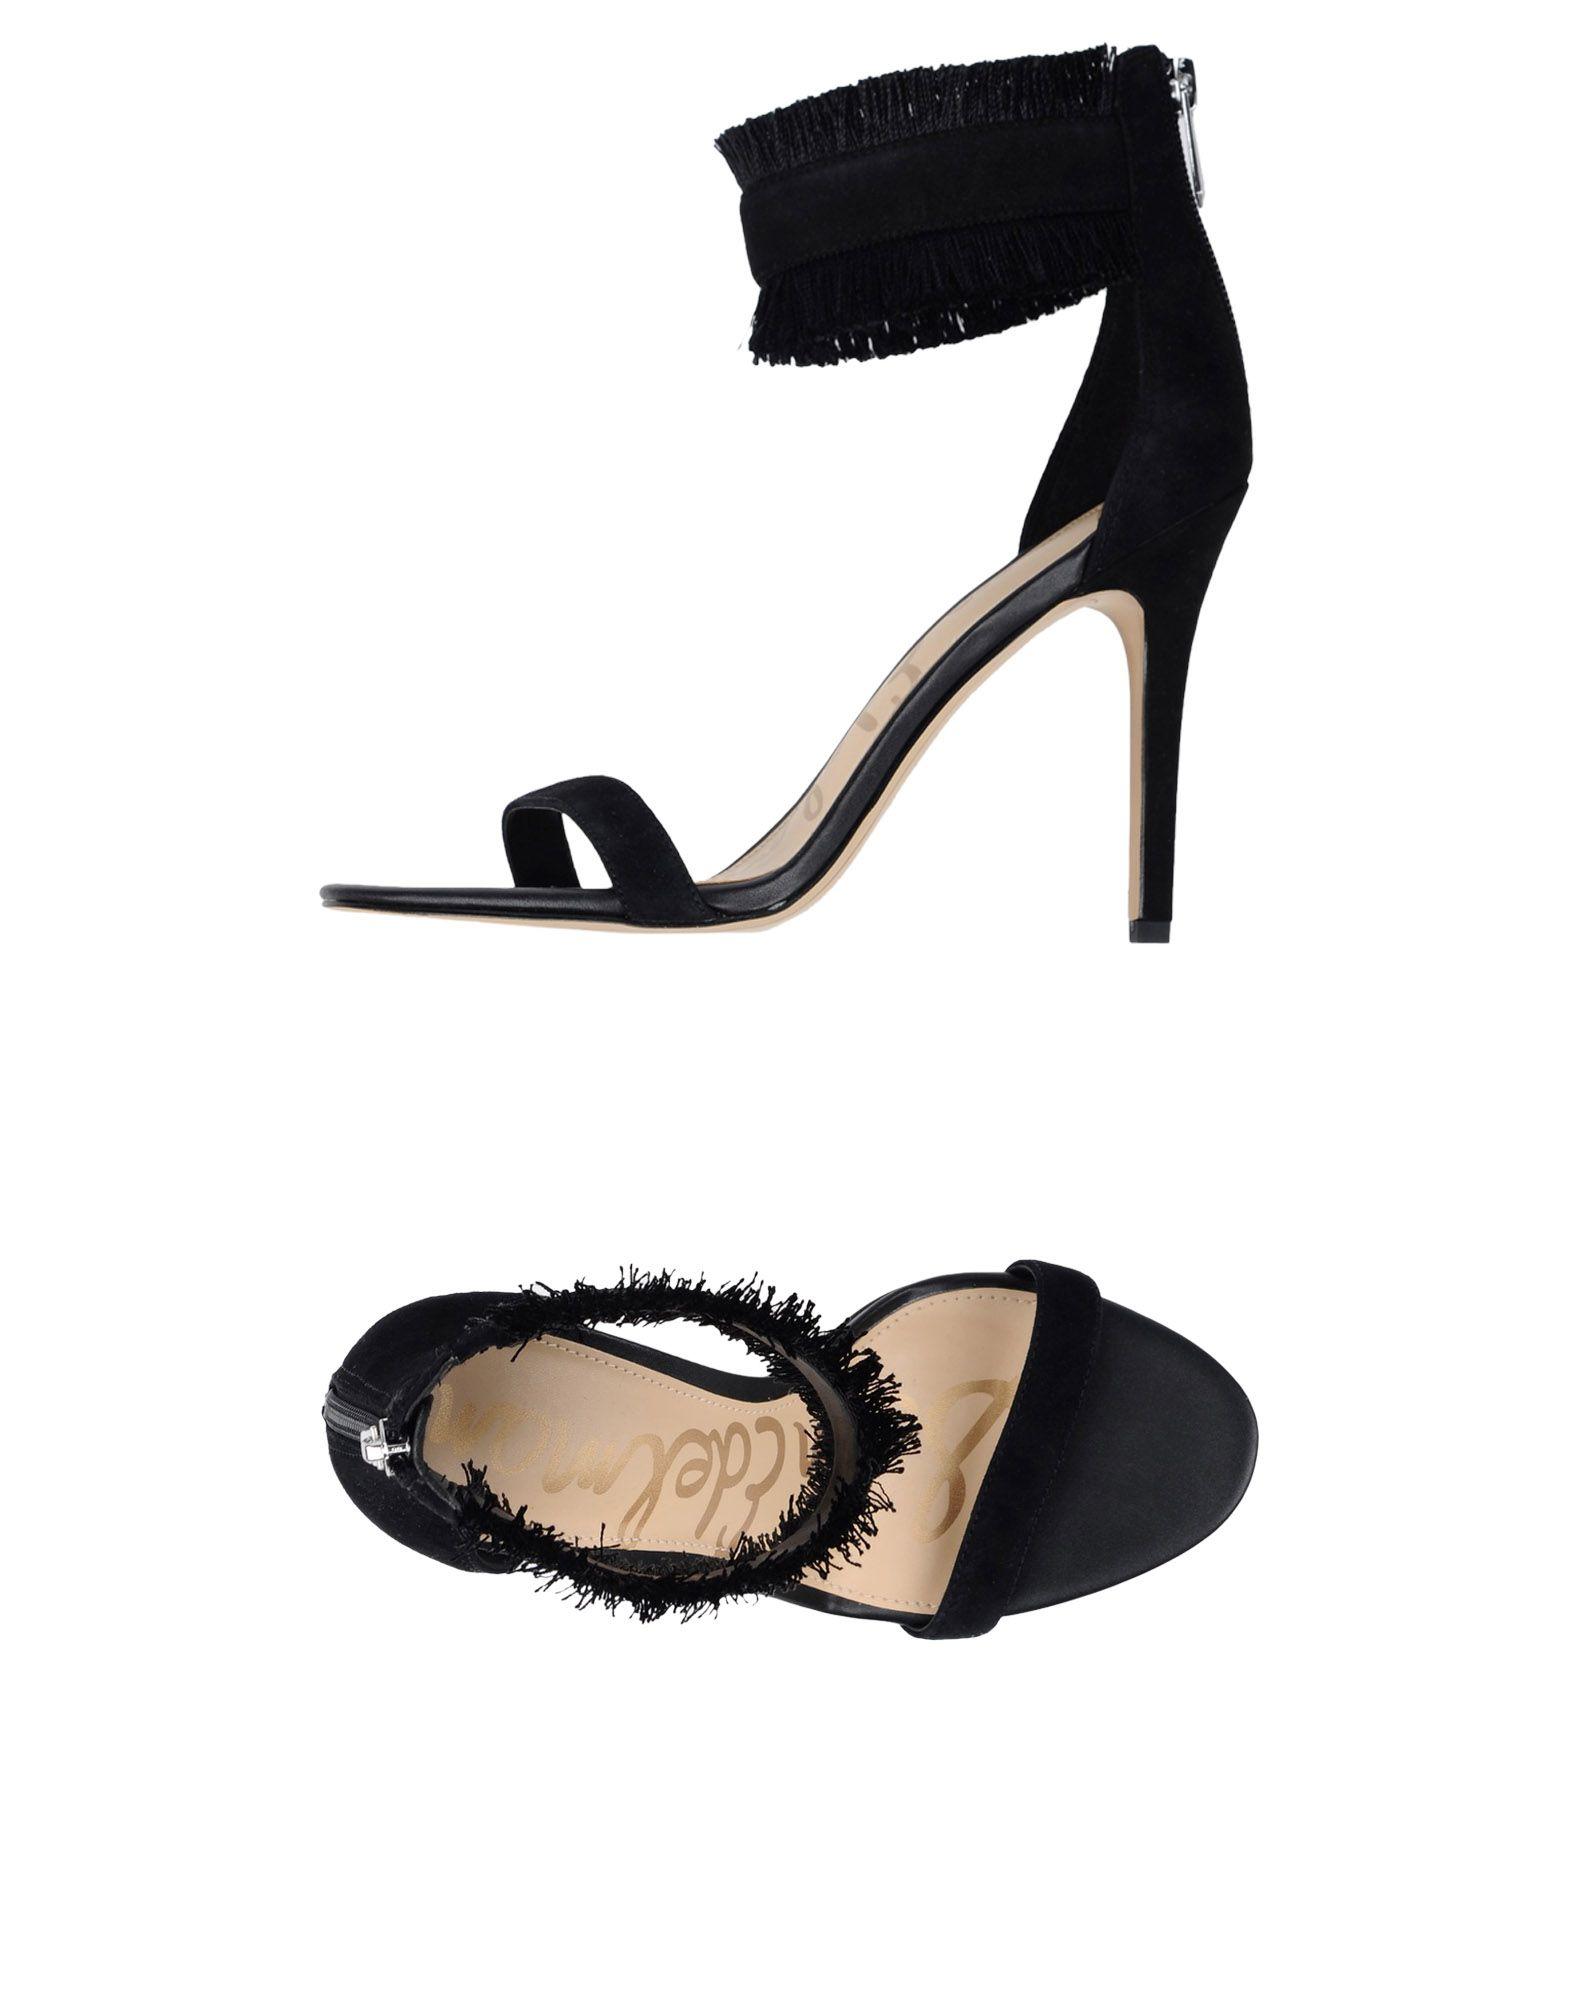 Sam Edelman Sandalen Damen  11340104JM Gute Qualität beliebte Schuhe